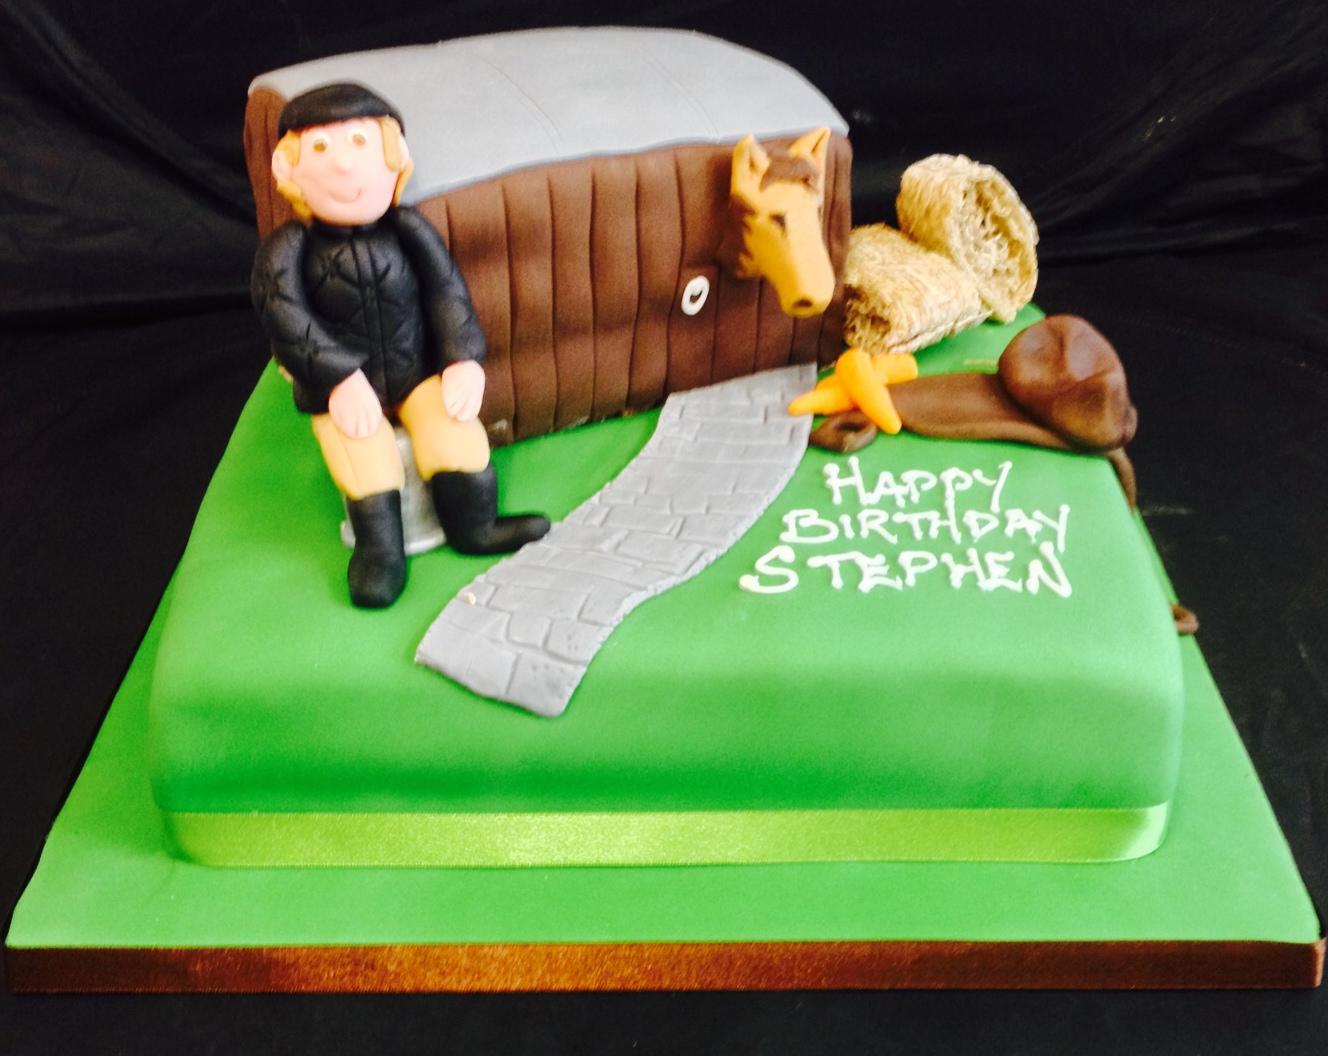 Newcastle Wedding Amp Birthday Cakes Celebration Cakes By